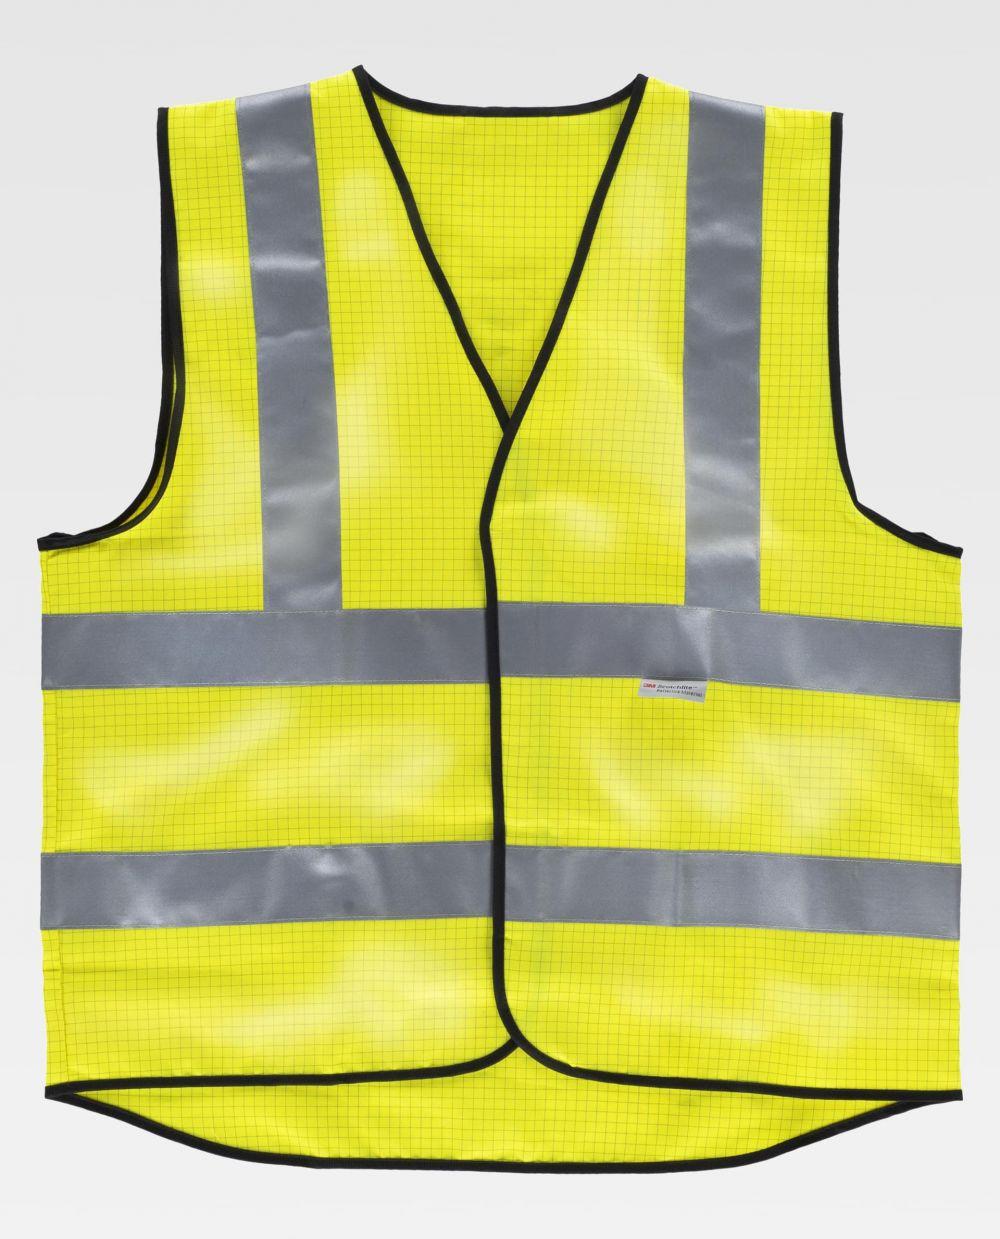 Chalecos reflectantes personalizados workteam hvtt20 de algodon vista 2